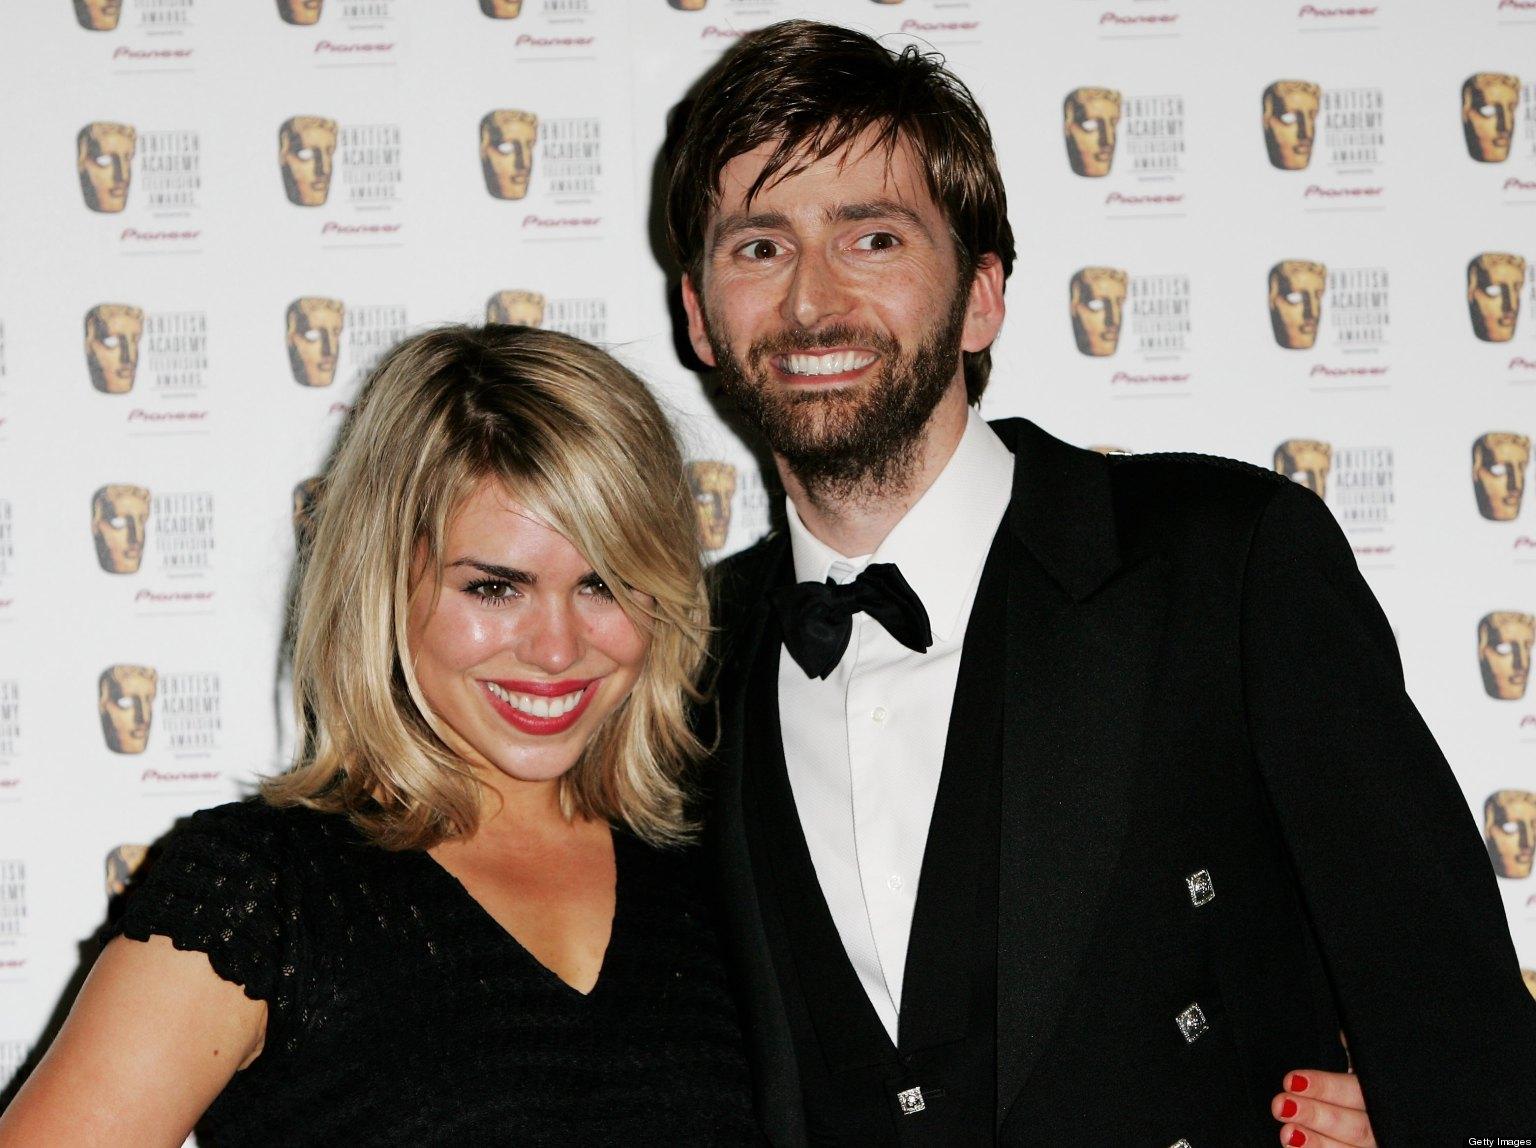 David Tennant, Billie Piper Returning To 'Doctor Who' For ... David Tennant Billie Piper 50th Anniversary